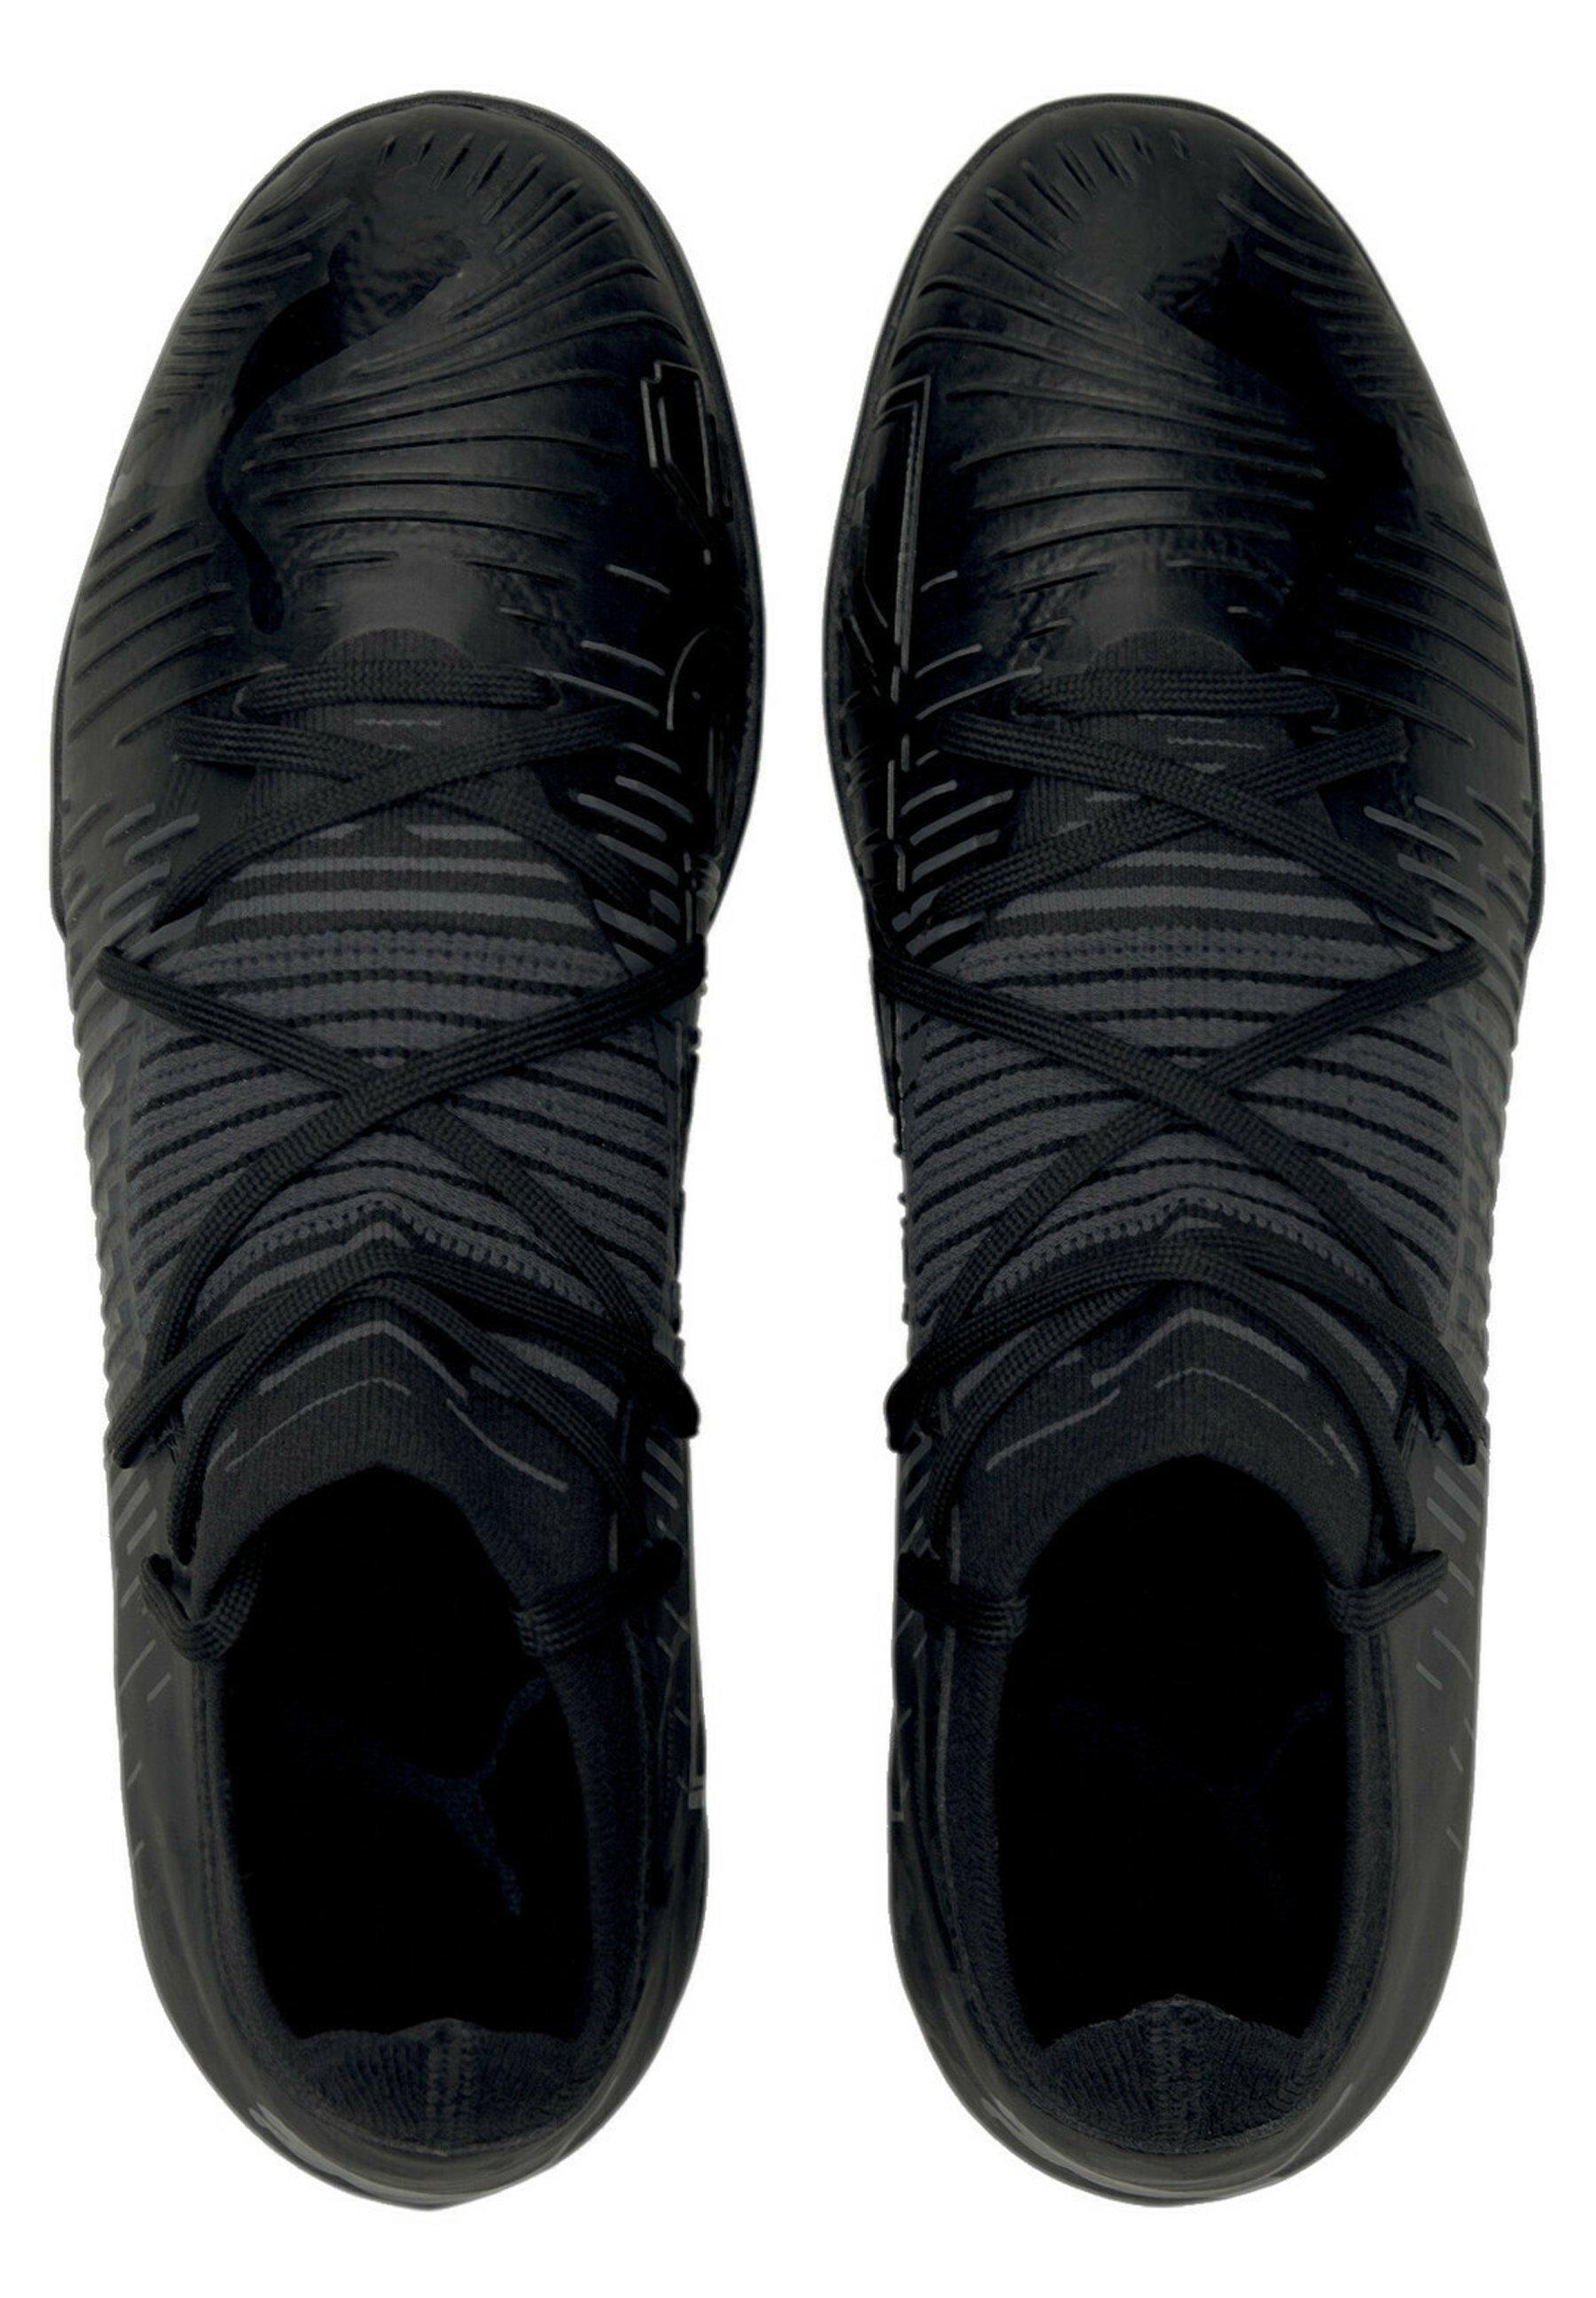 Herrer FUTURE Z - Fodboldstøvler m/ multi knobber